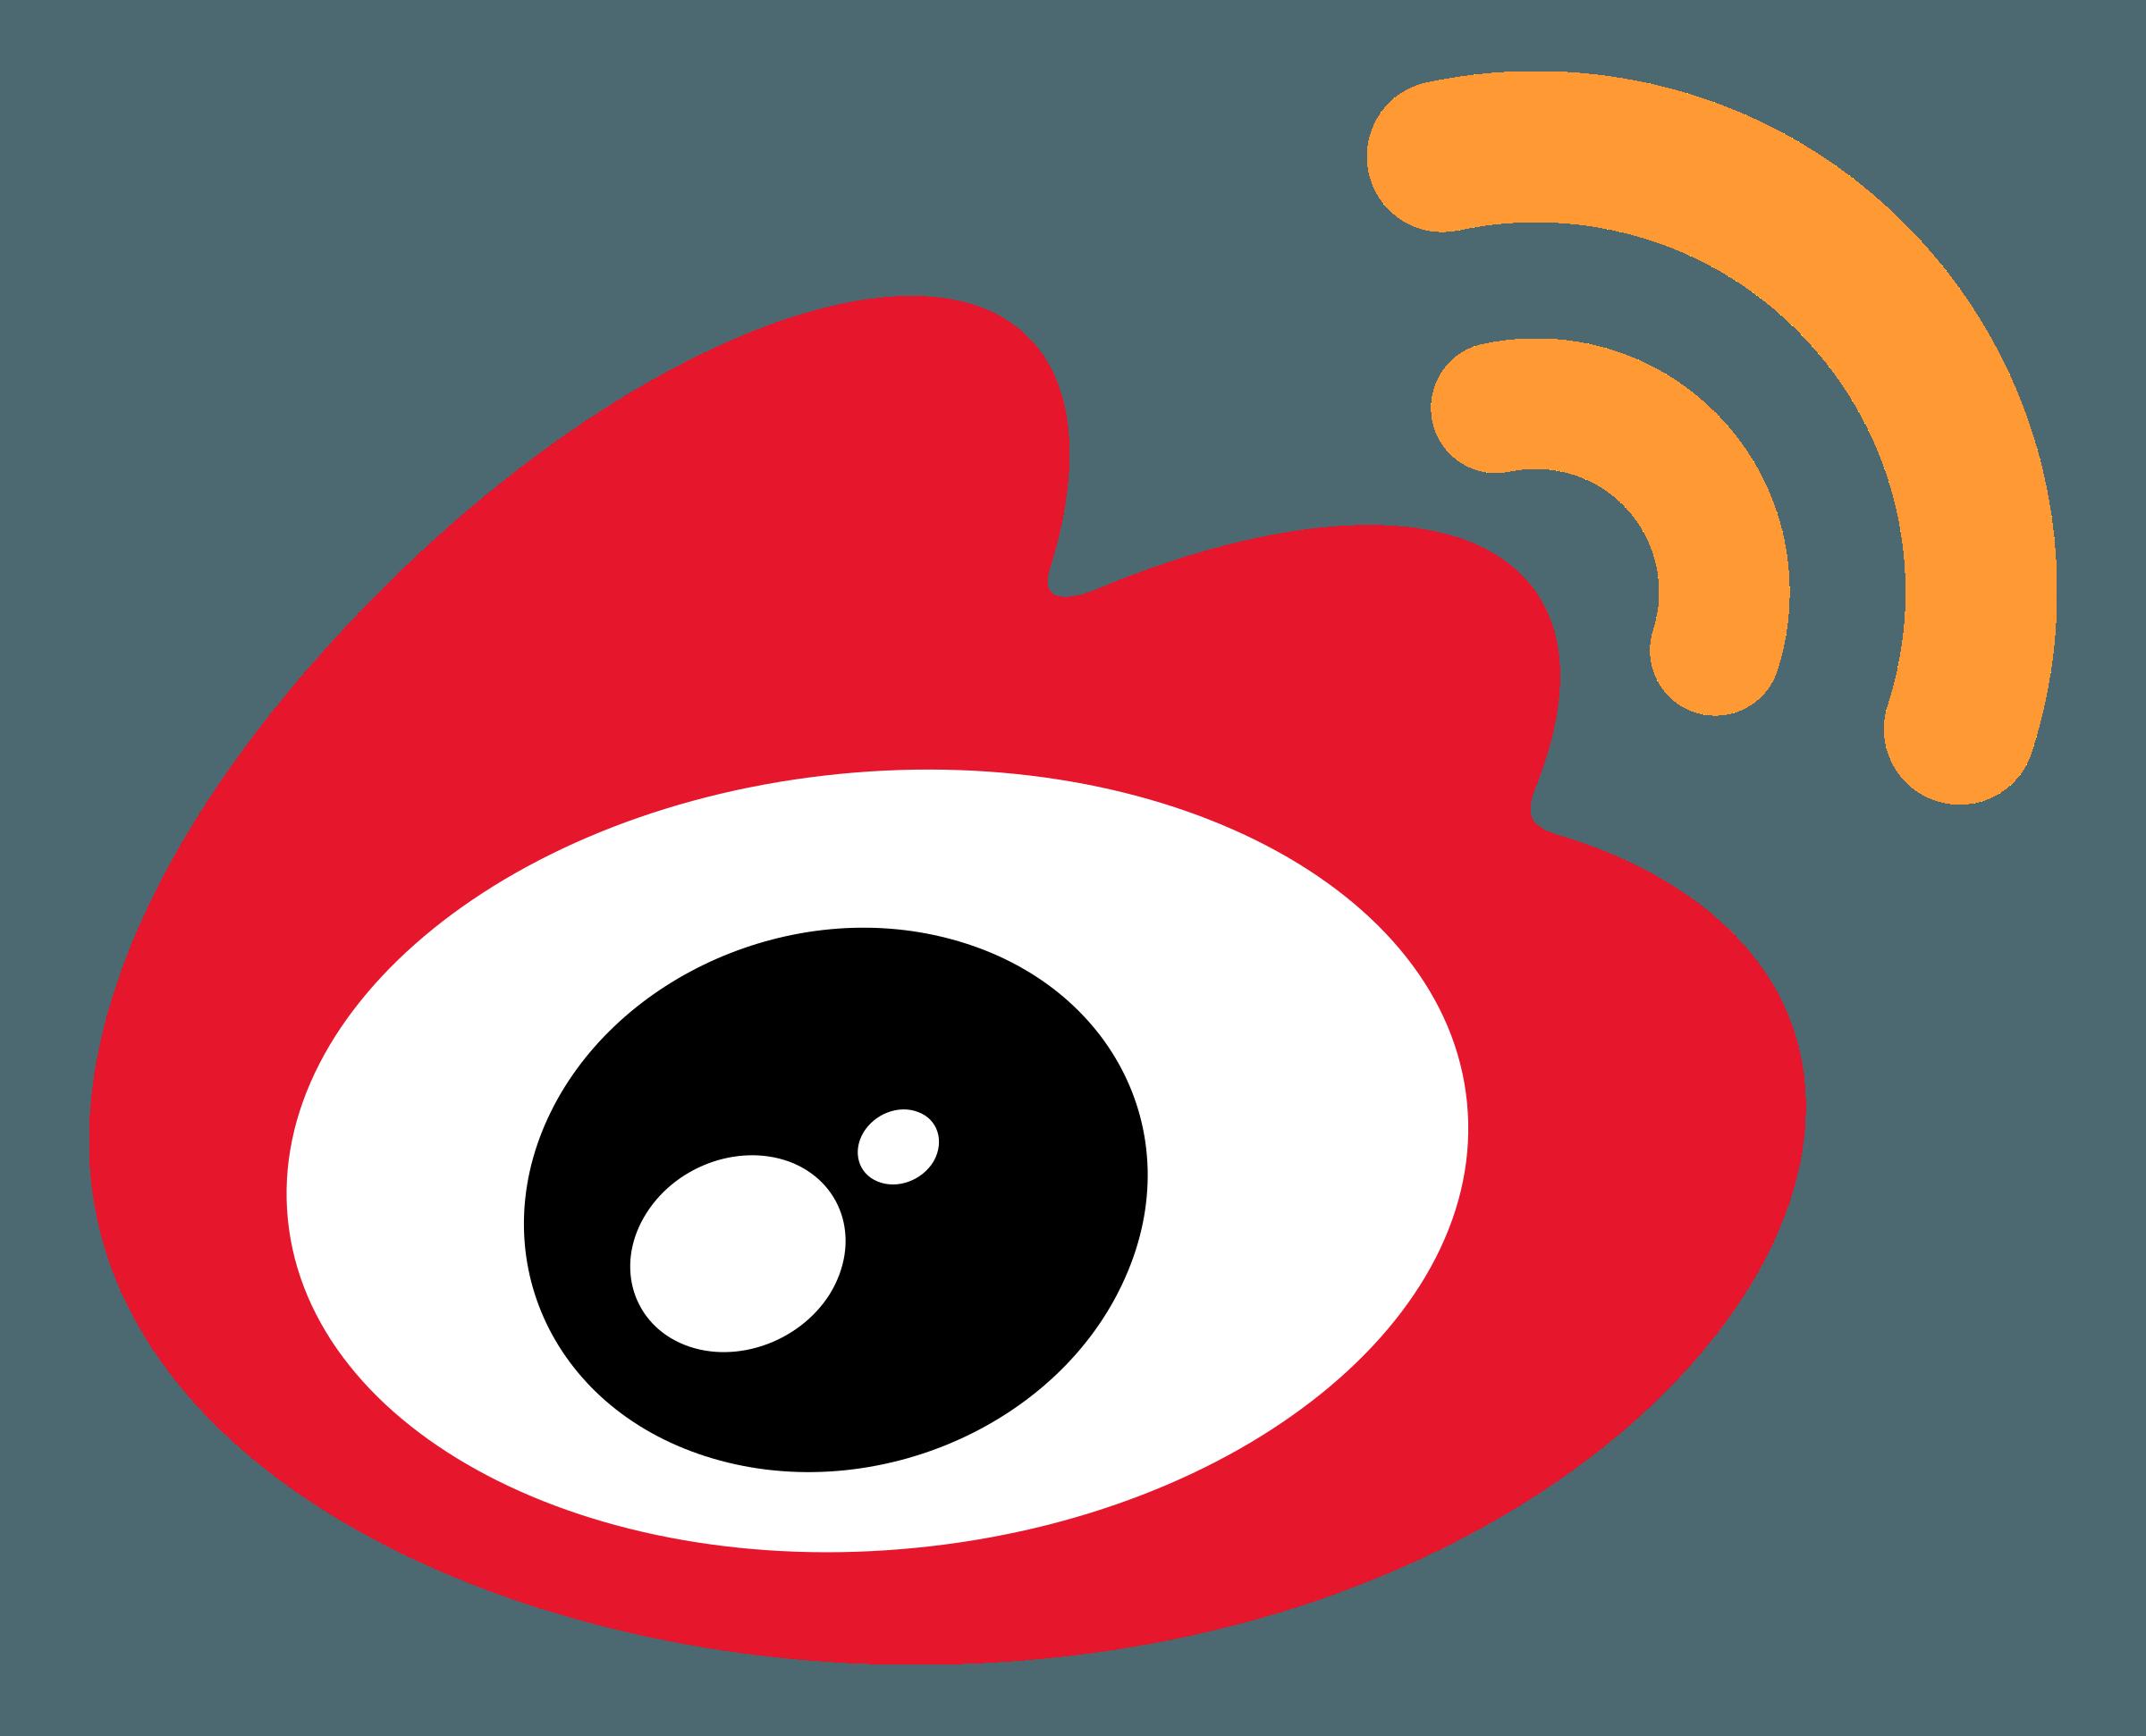 Weibo Logo PNG Transparent & SVG Vector.